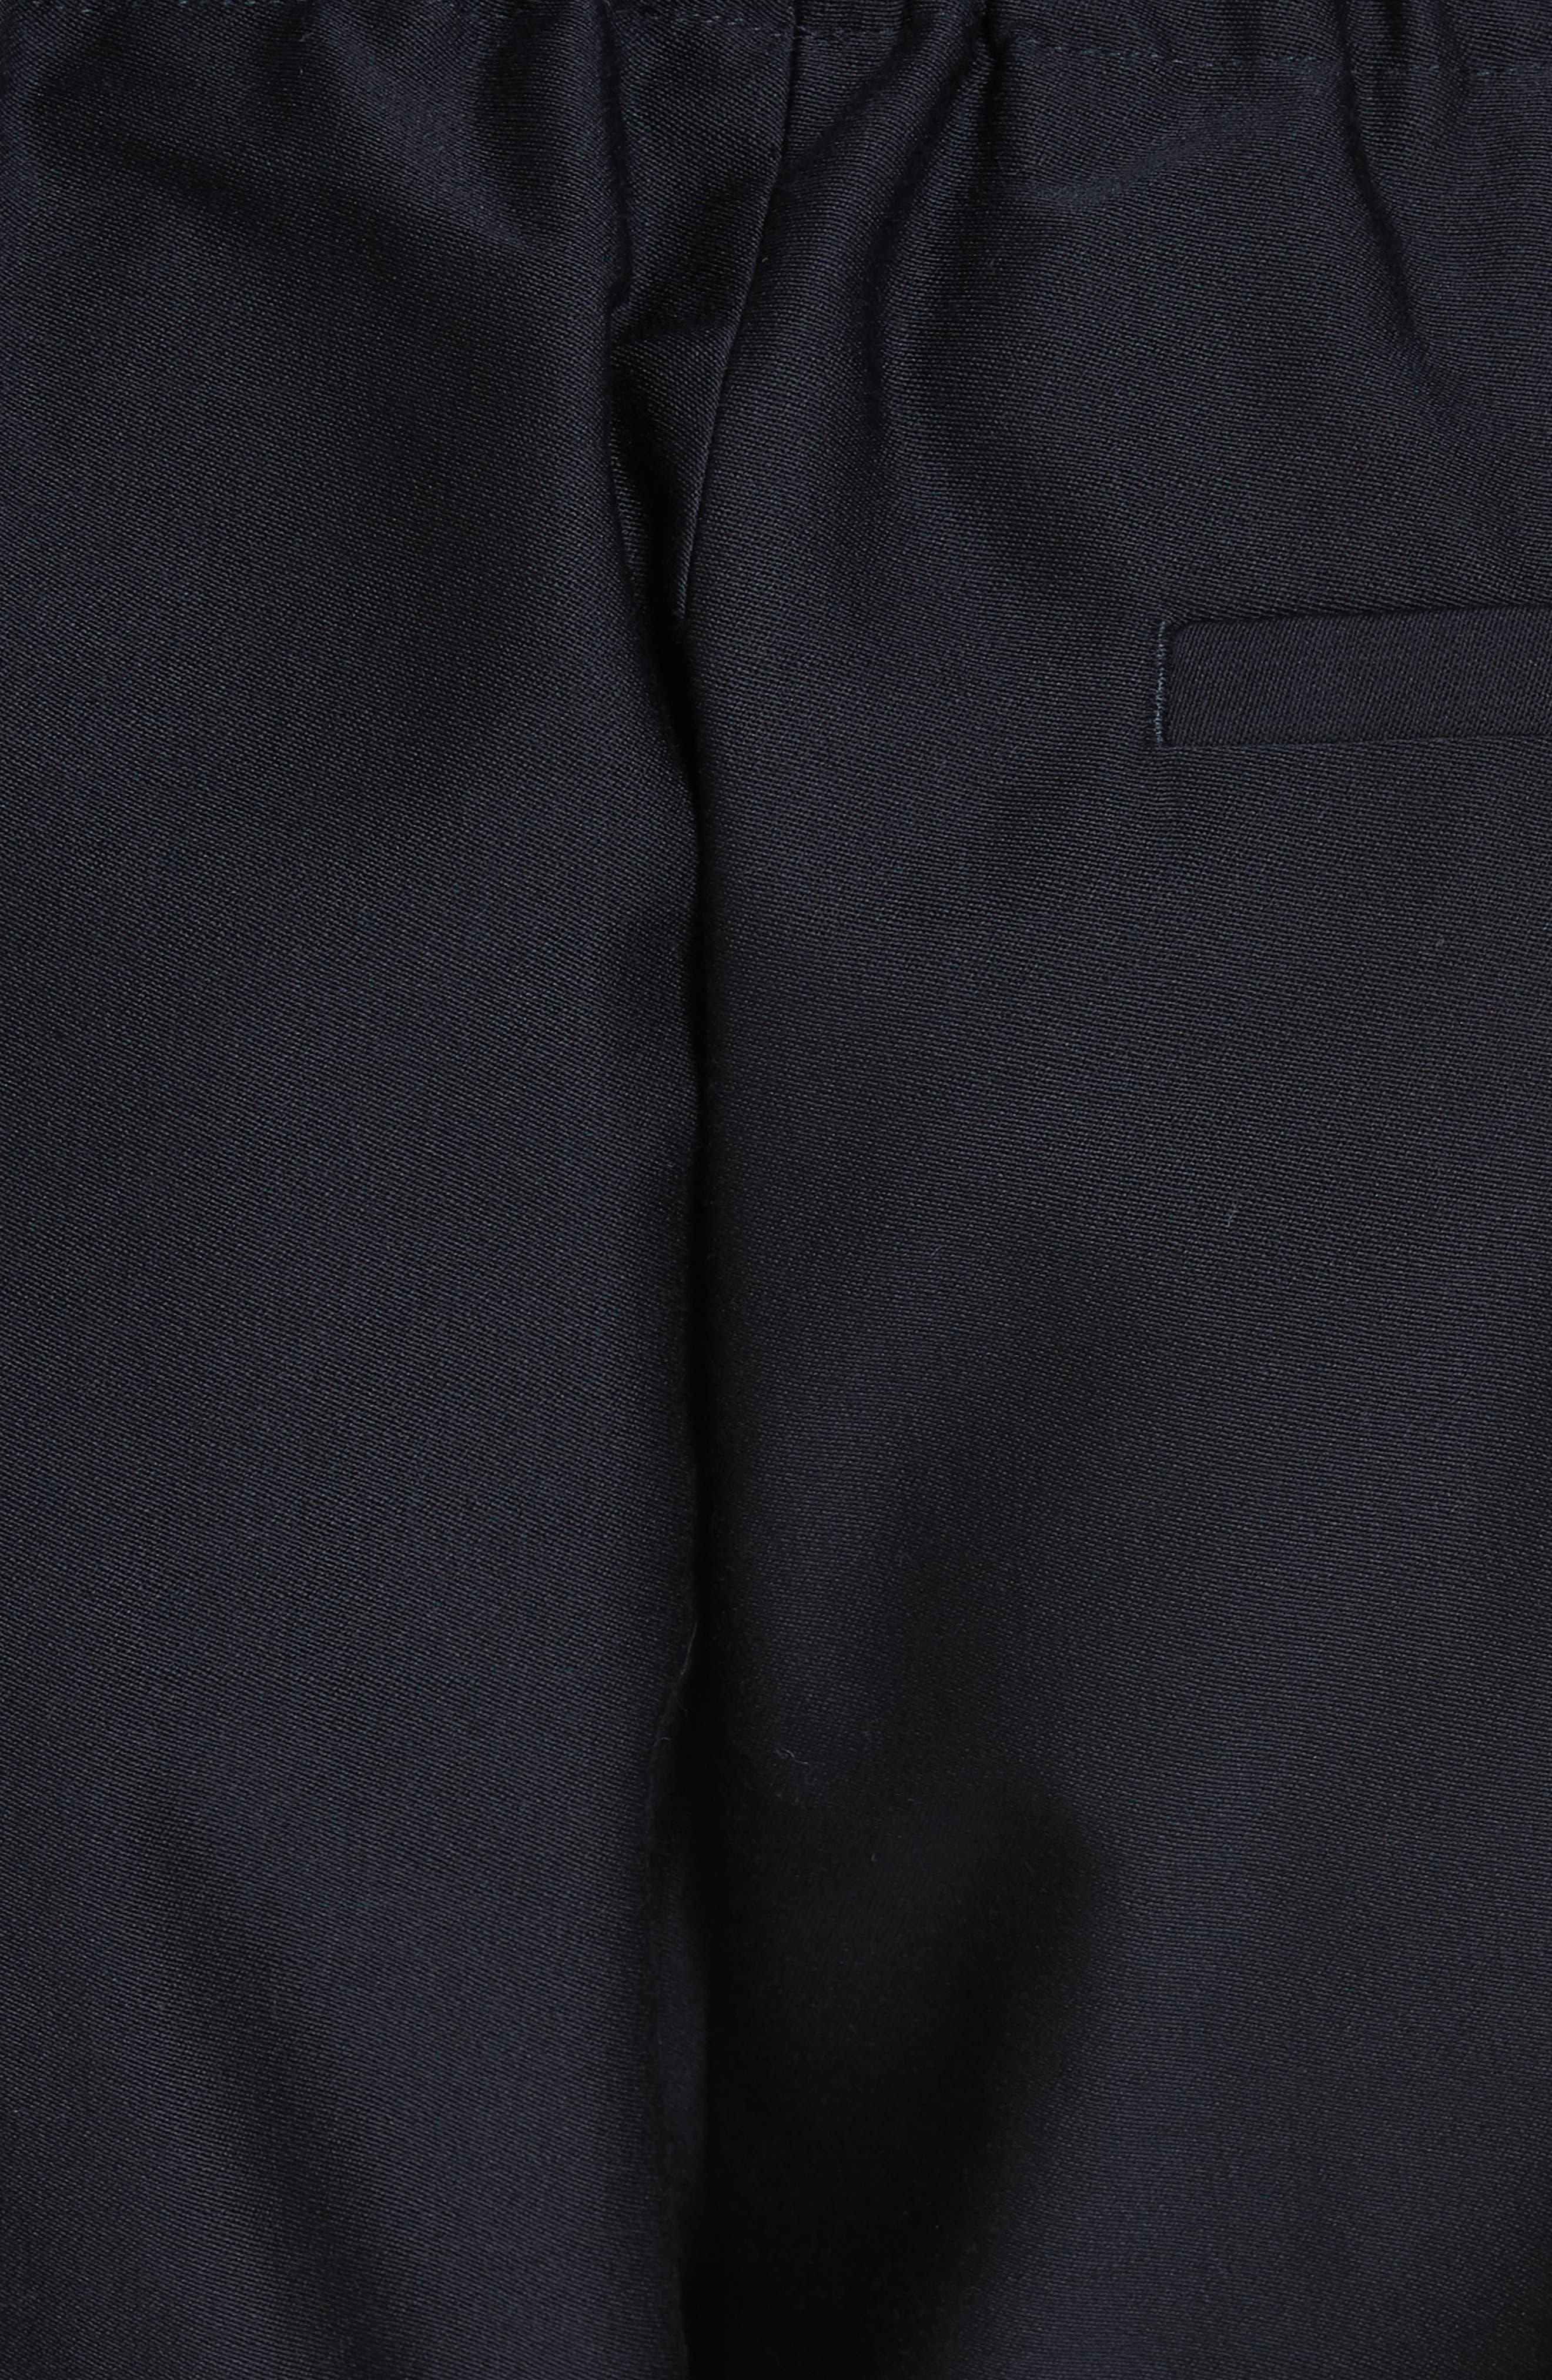 Perkino Drawstring Waist Pants,                             Alternate thumbnail 5, color,                             410